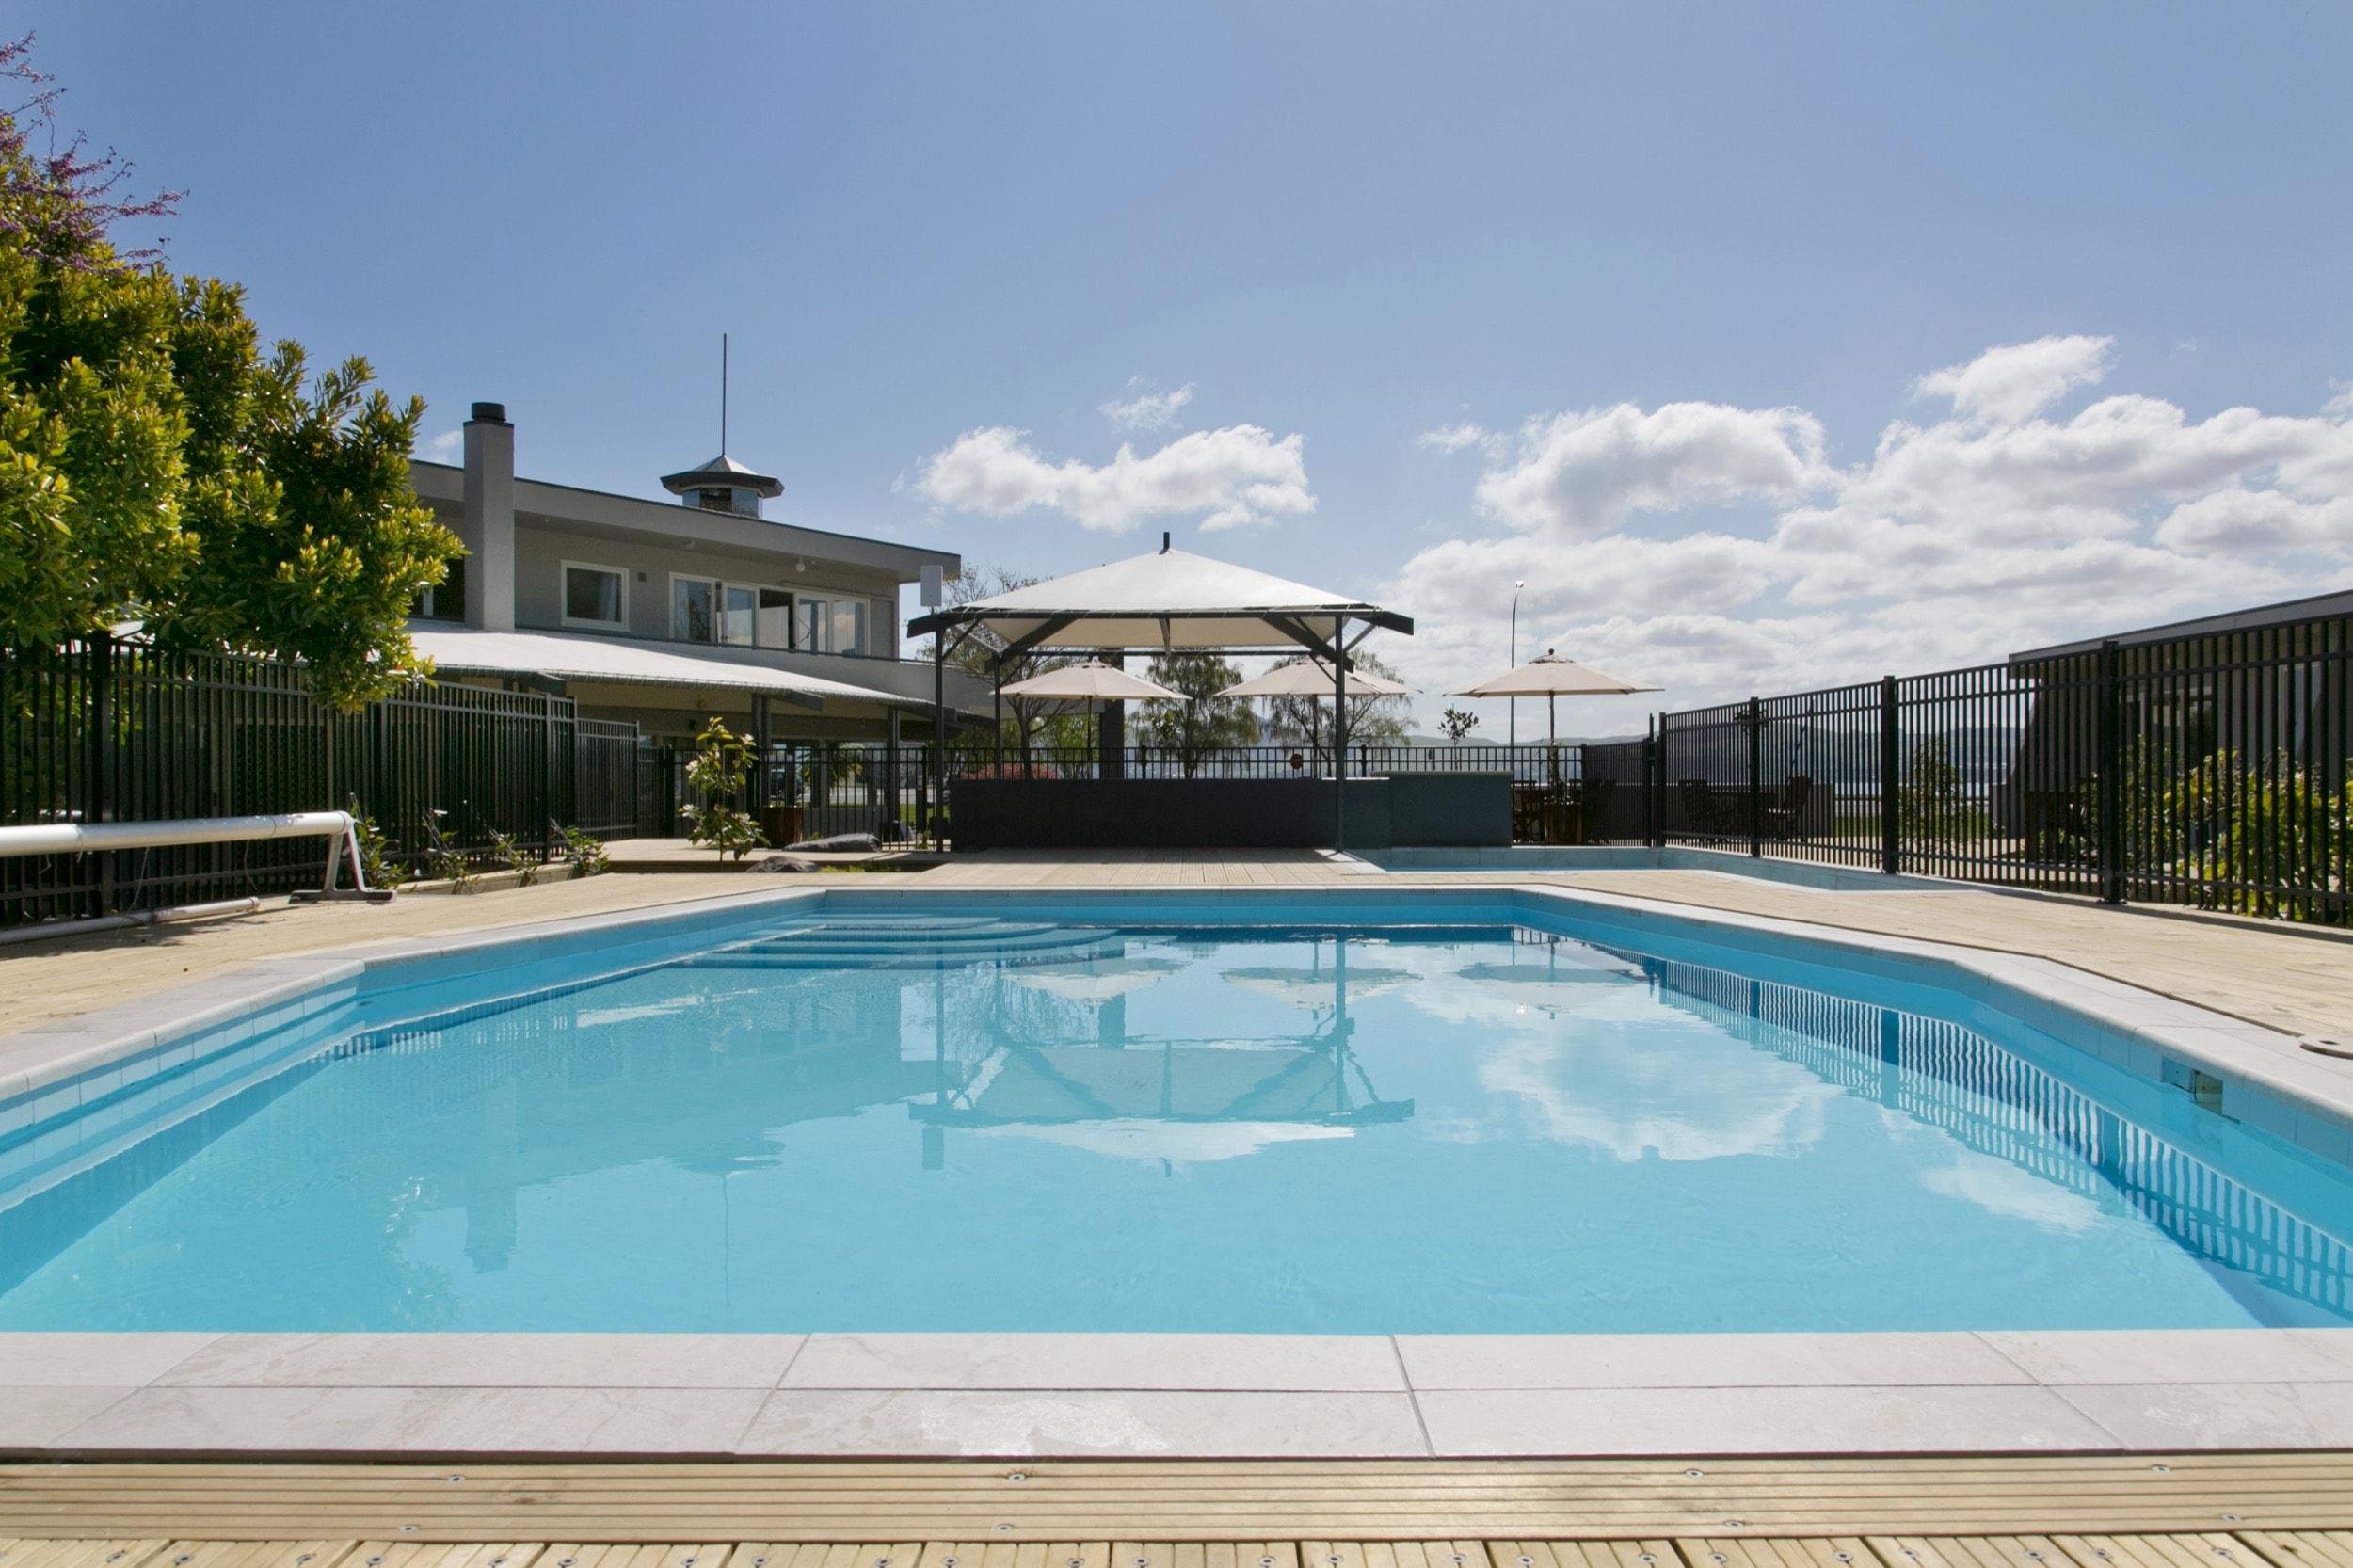 pool area heated swimming pool 1-min.jpg